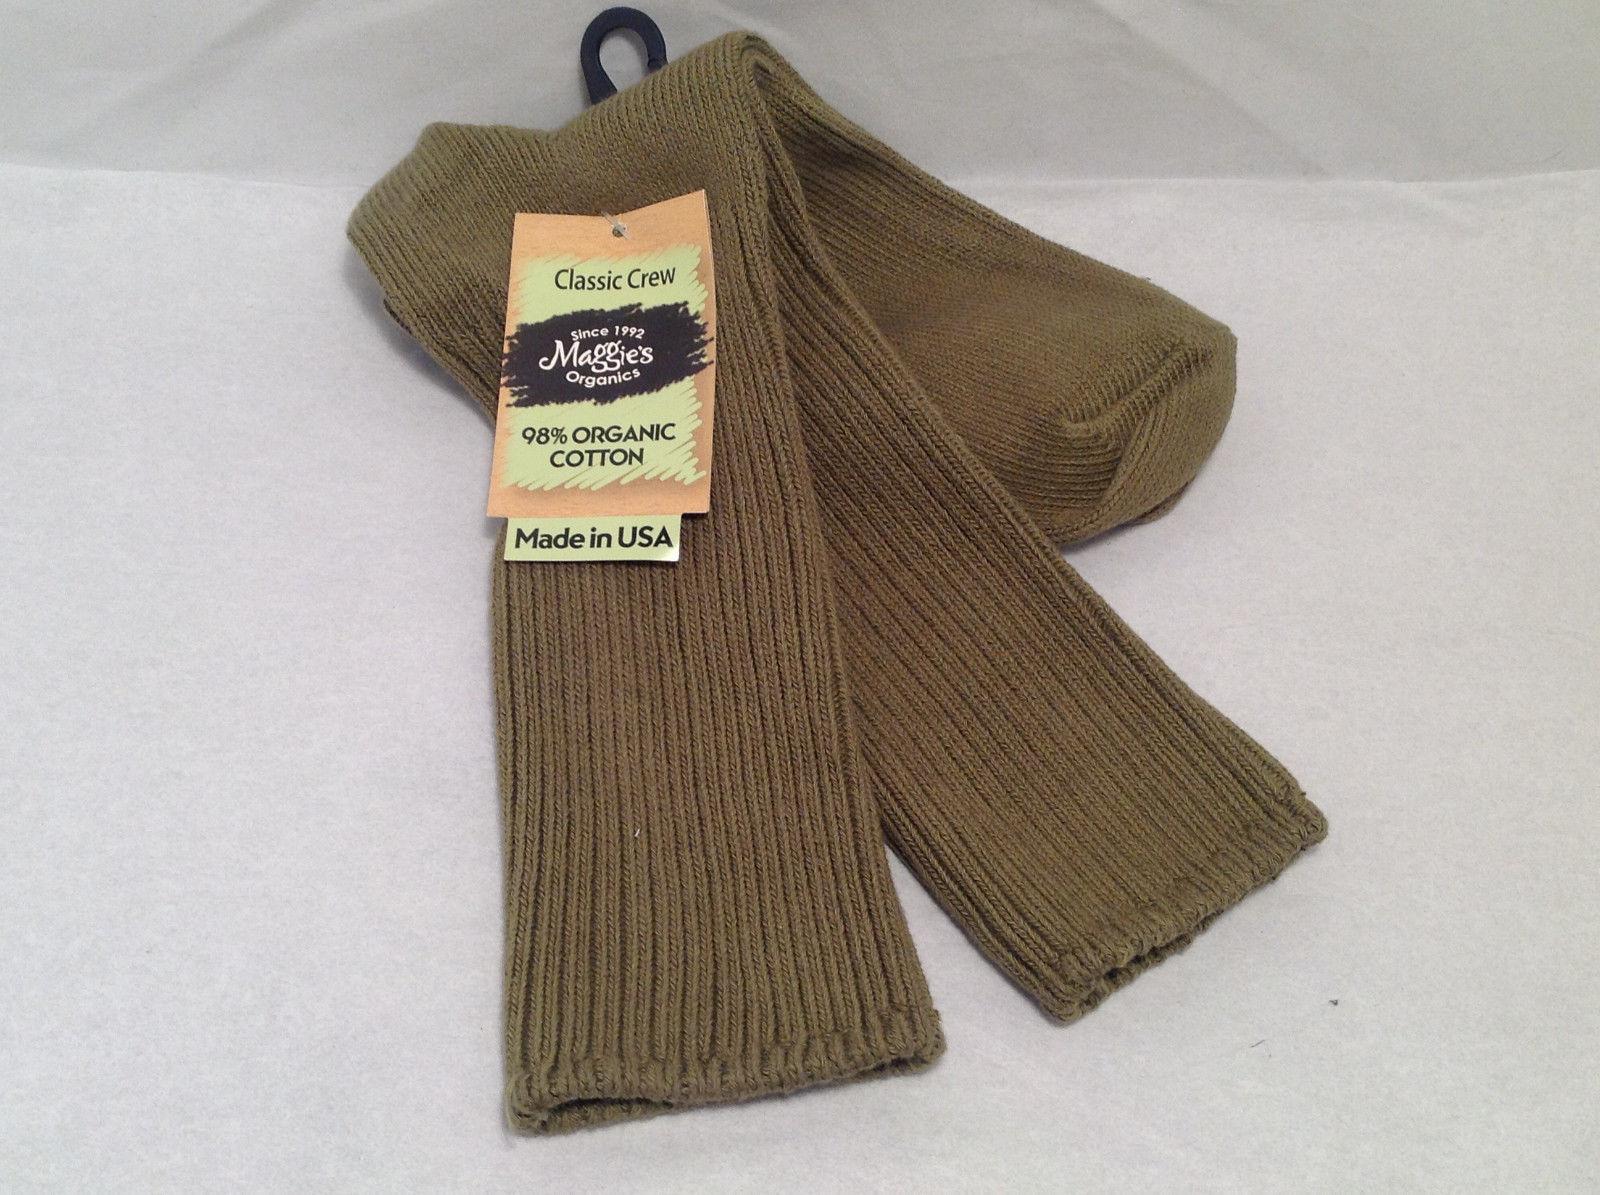 Maggie's Organics Classic Crew Socks 98% Organic Cotton Olive Army Drab Brown